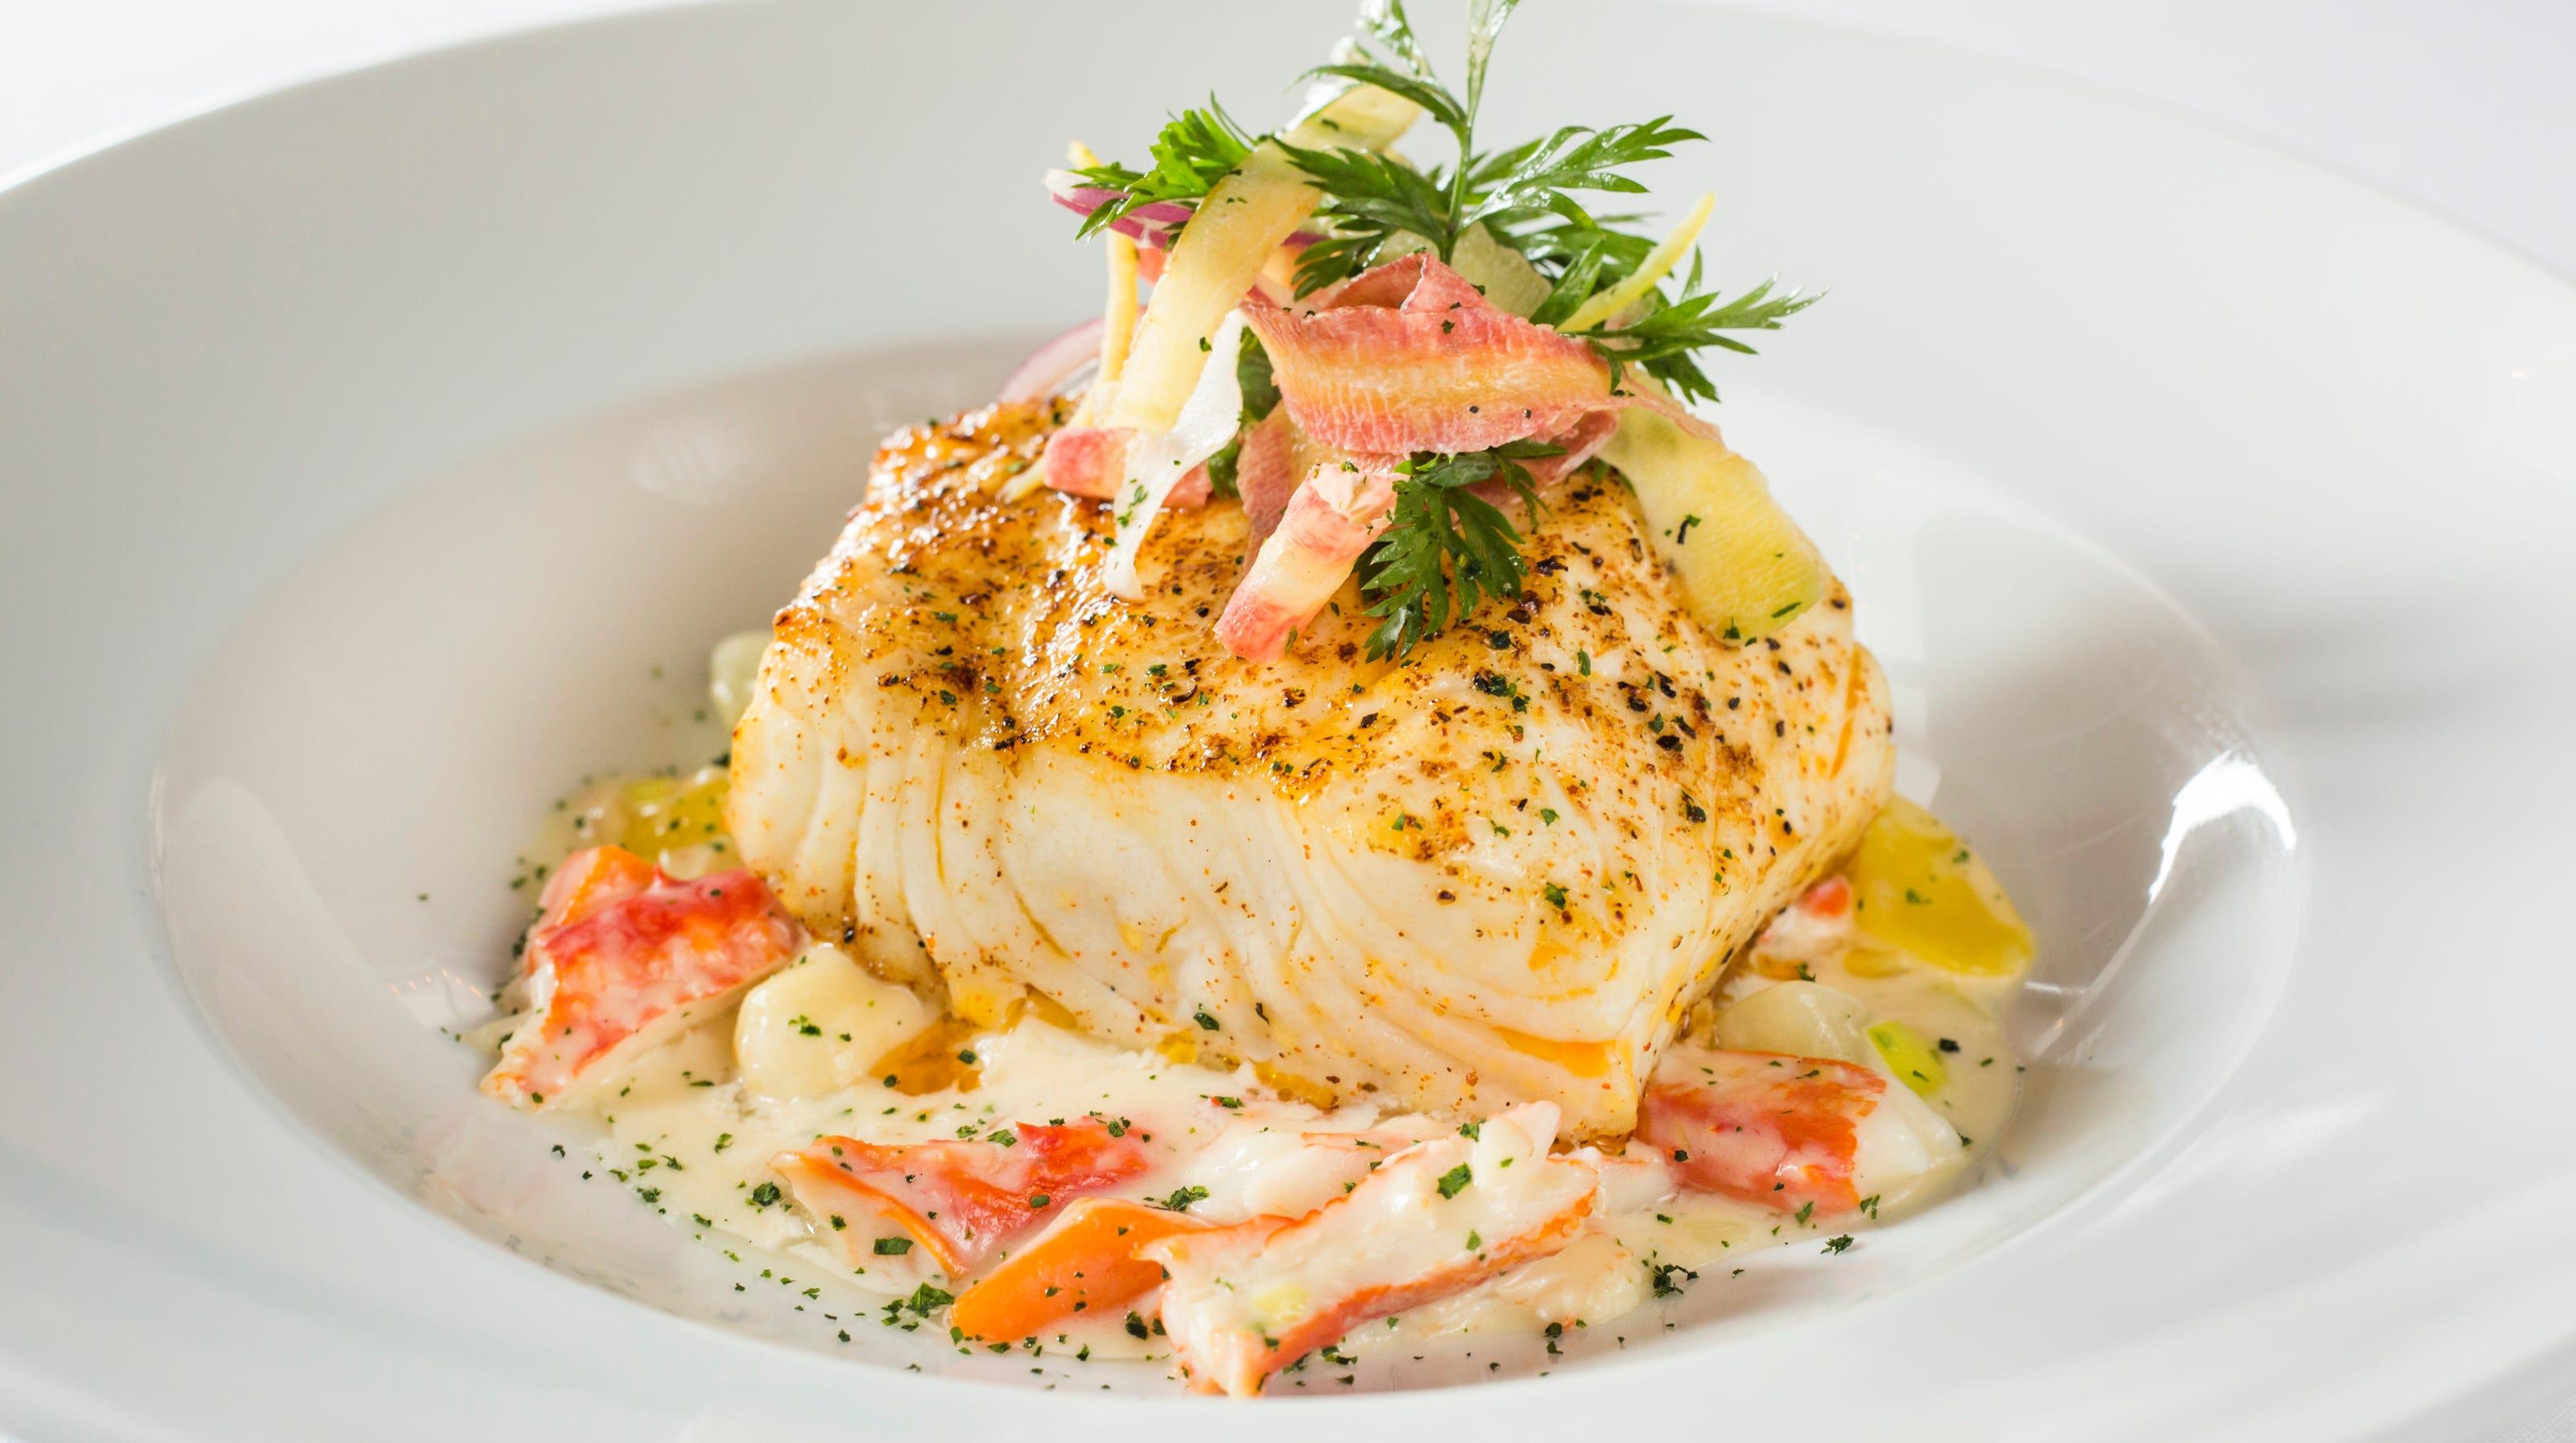 Restaurants In Naples Fort Myers Offering Deals Specials On Valentine S Day